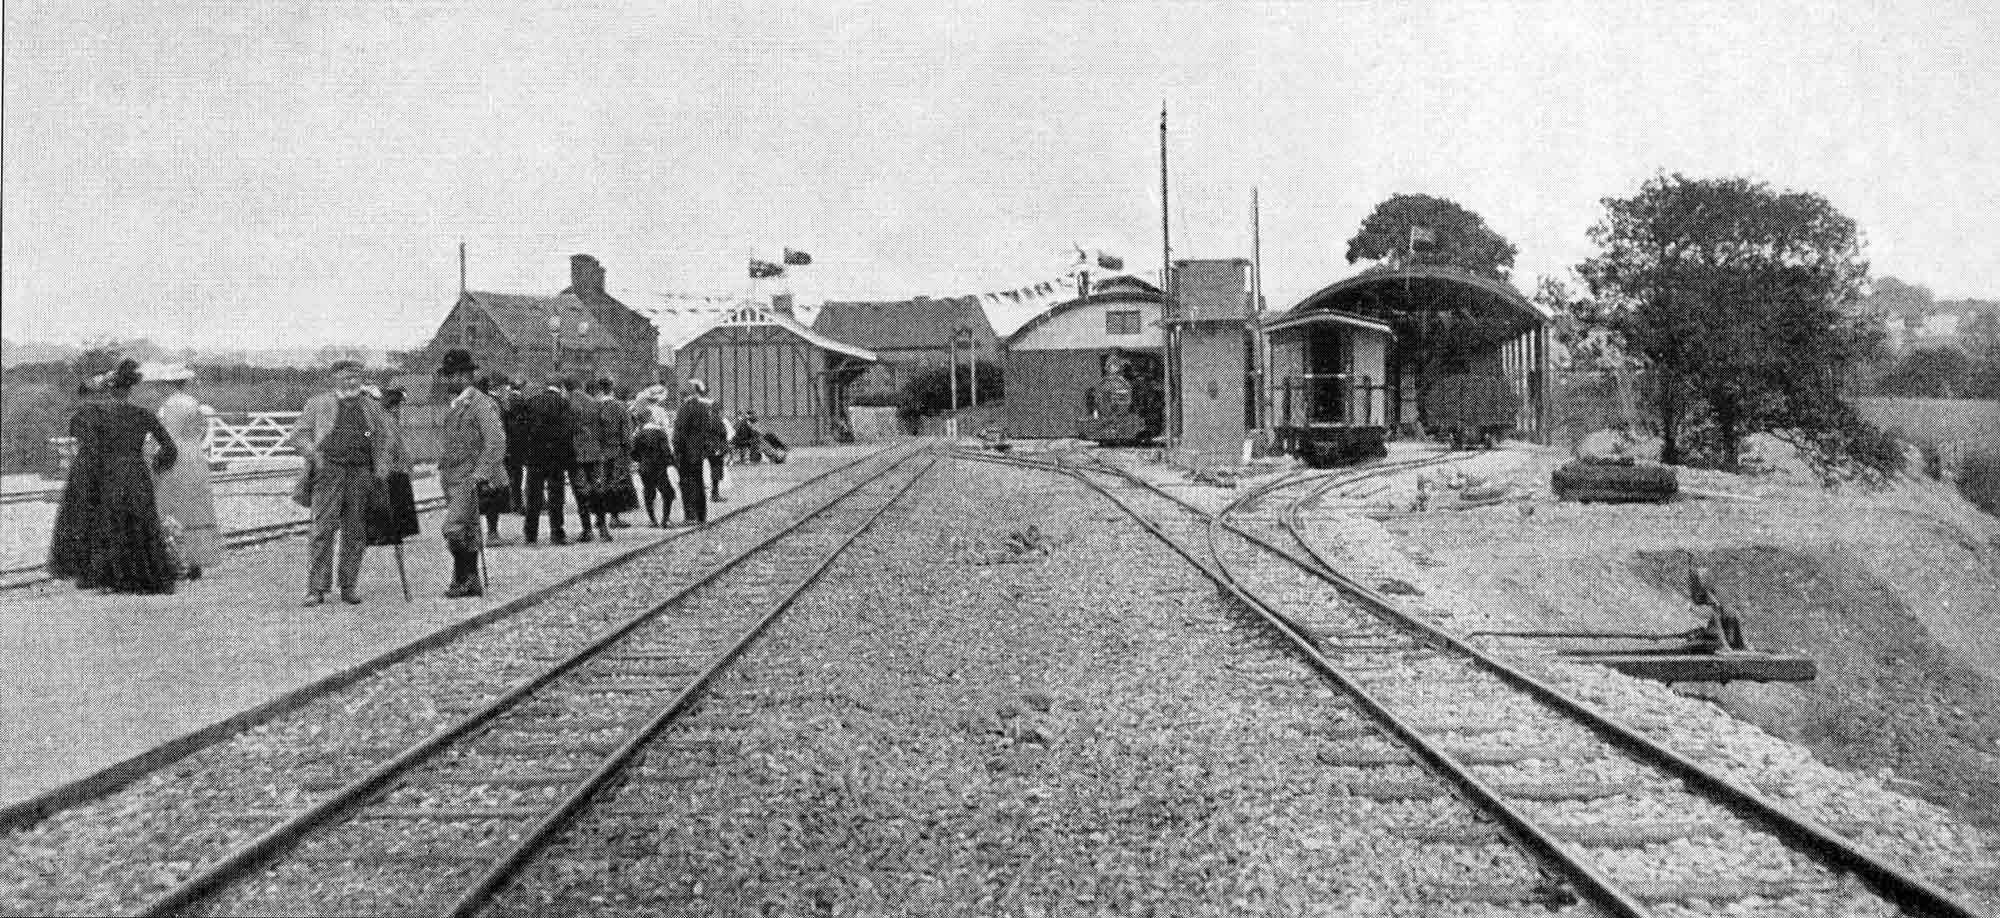 Hulme End railway station historic photograph 2